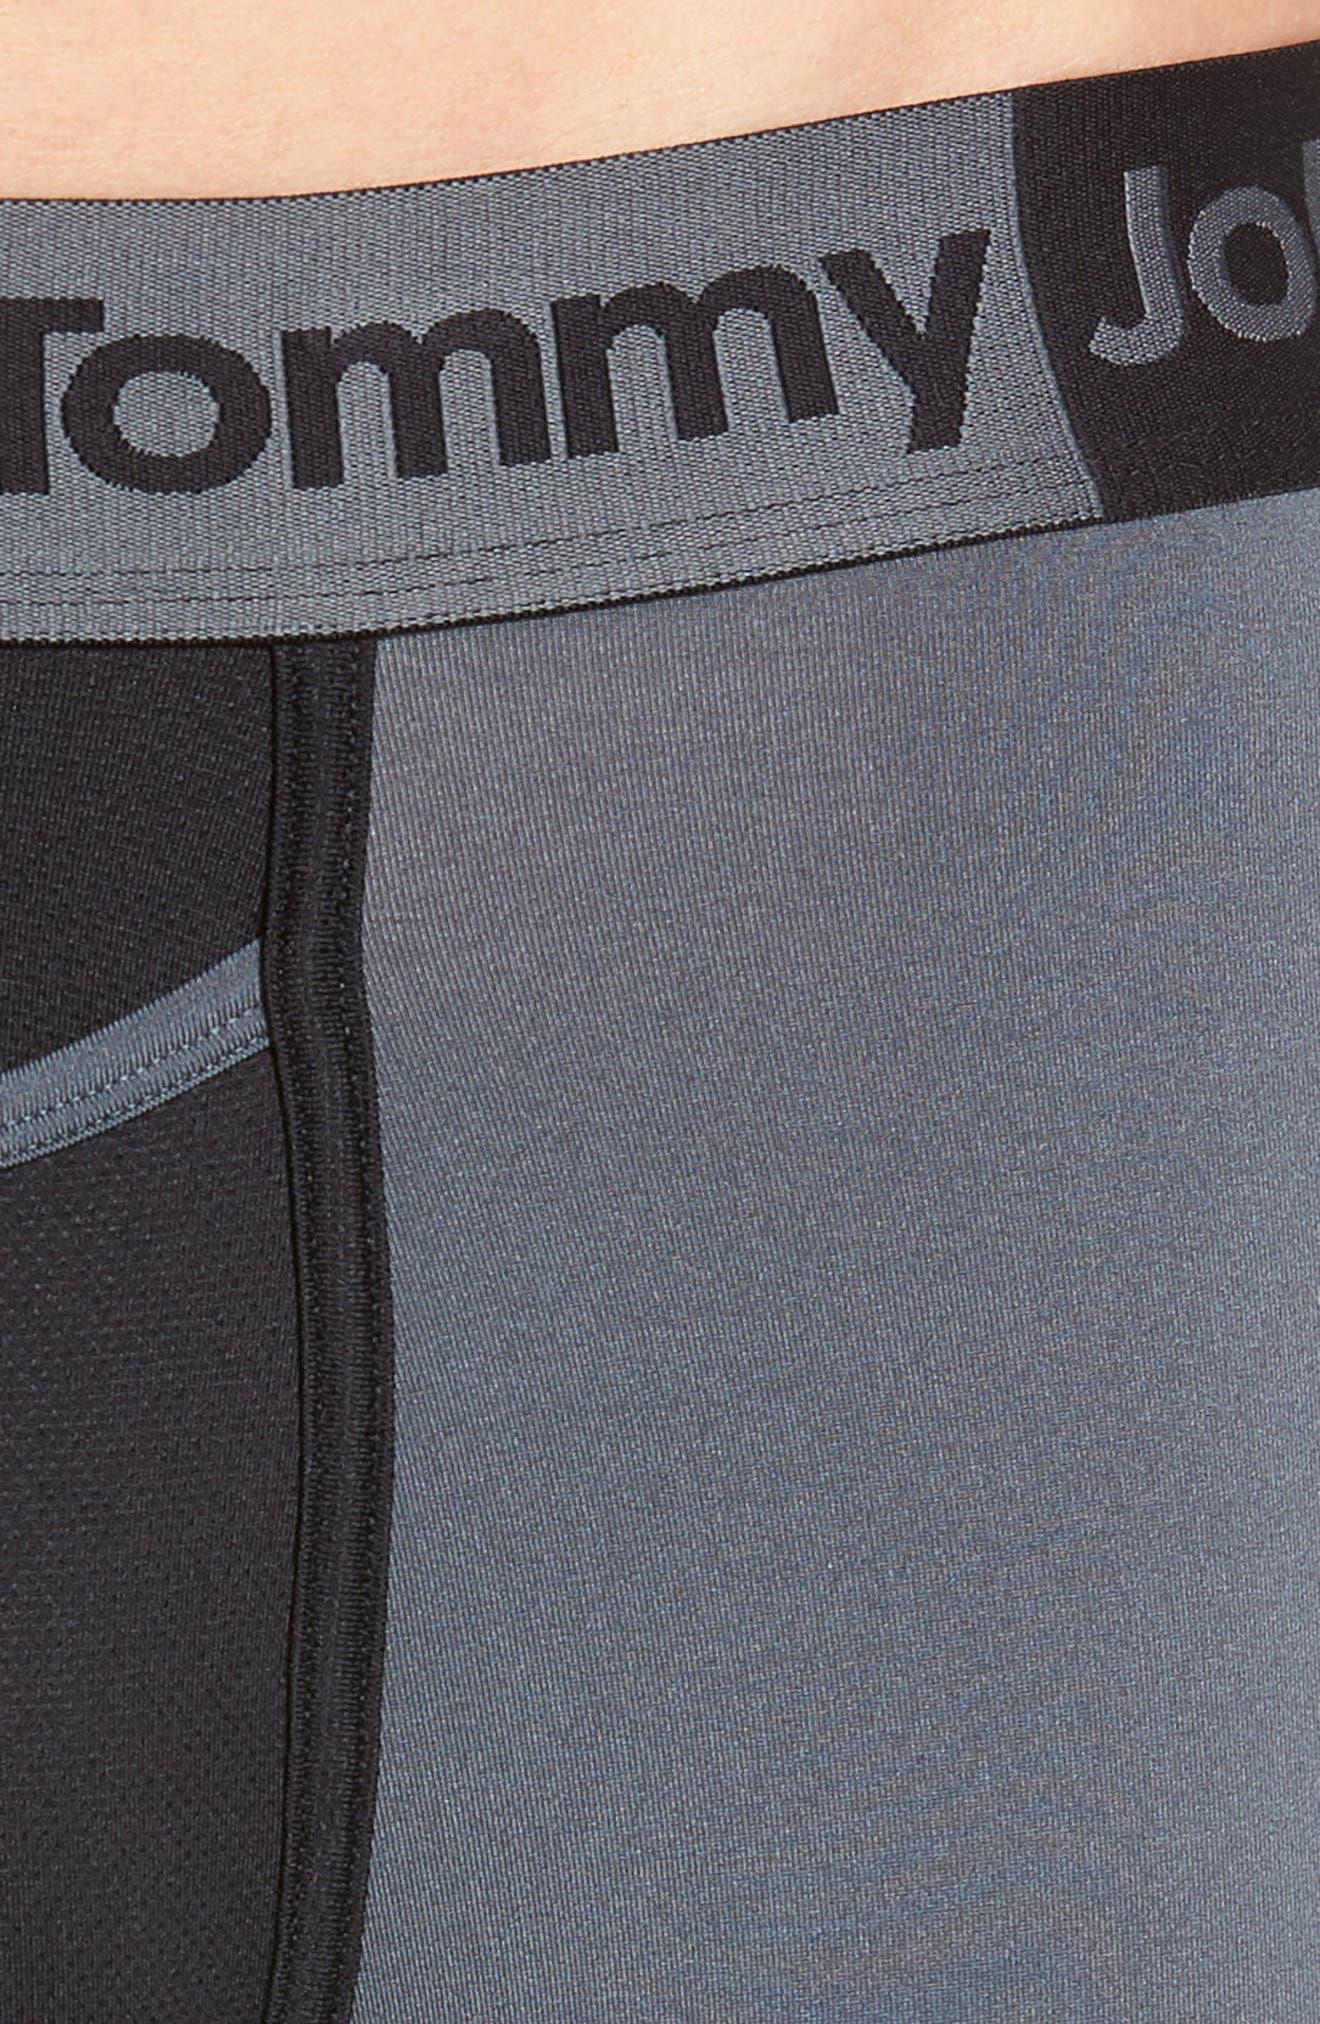 360 2.0 Boxer Briefs,                             Alternate thumbnail 4, color,                             TURBULENCE/ BLACK